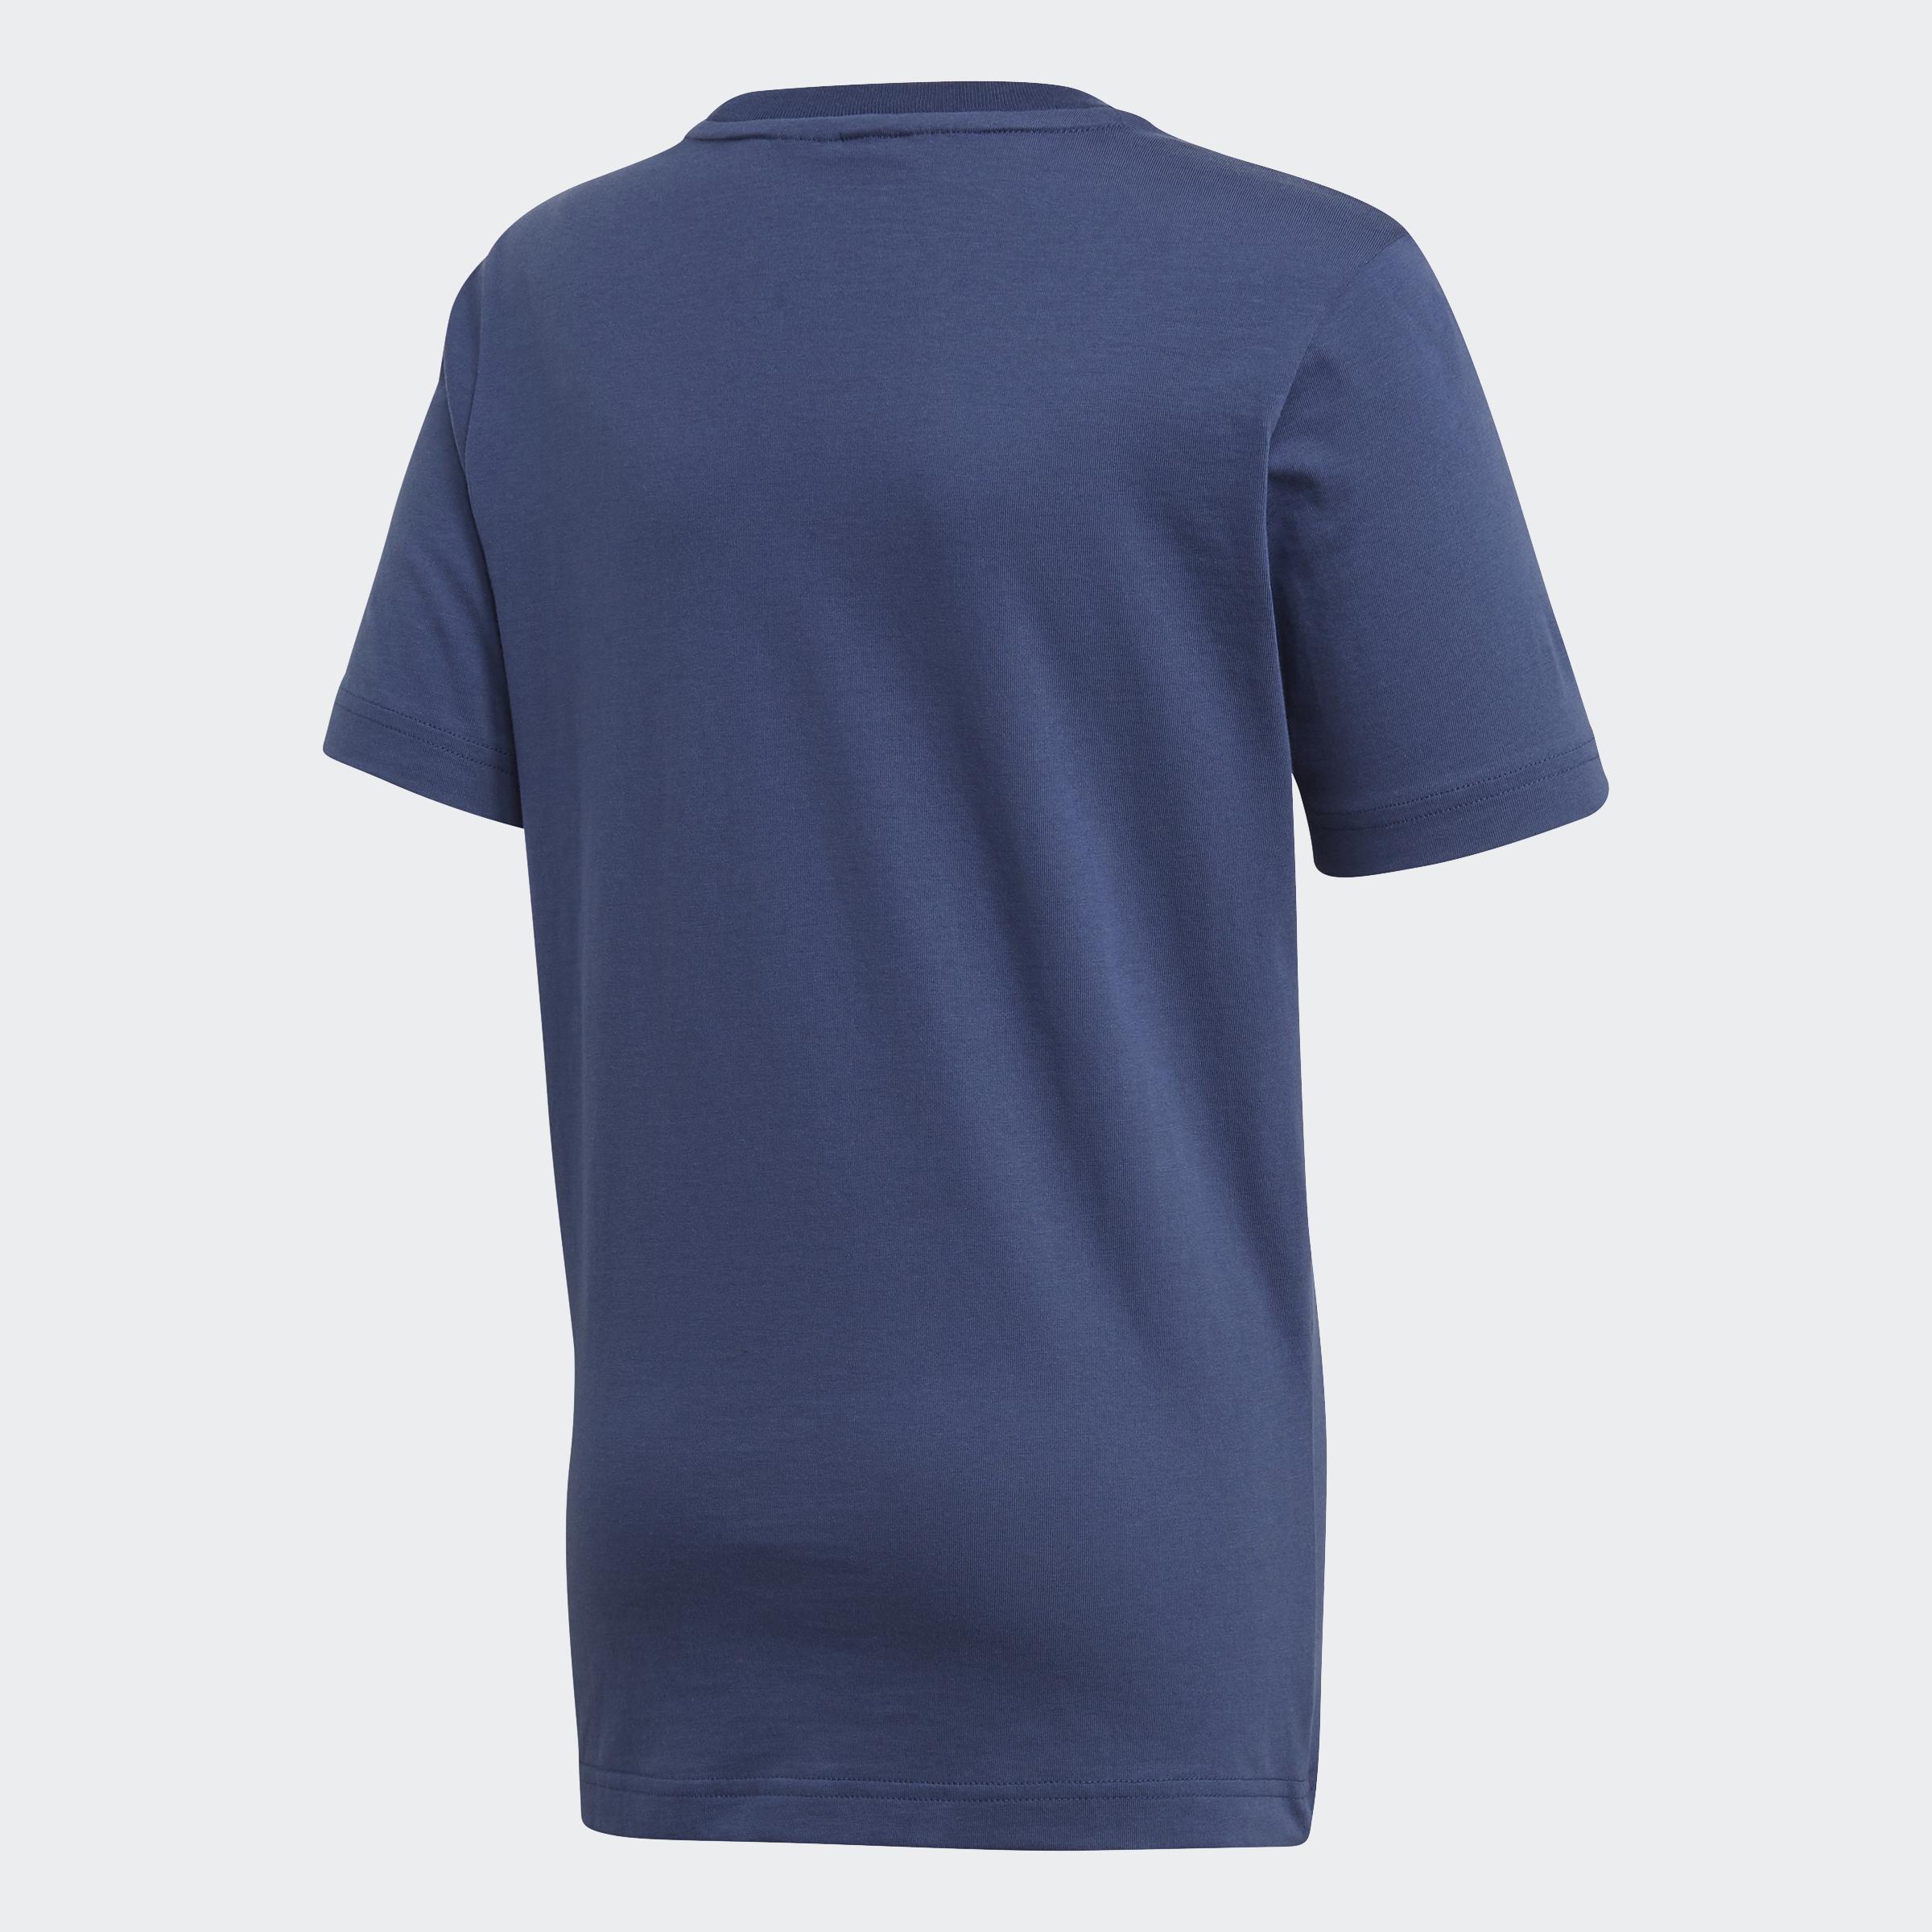 adidas-Must-Haves-Badge-of-Sport-Tee-Kids-039-Shirts thumbnail 17